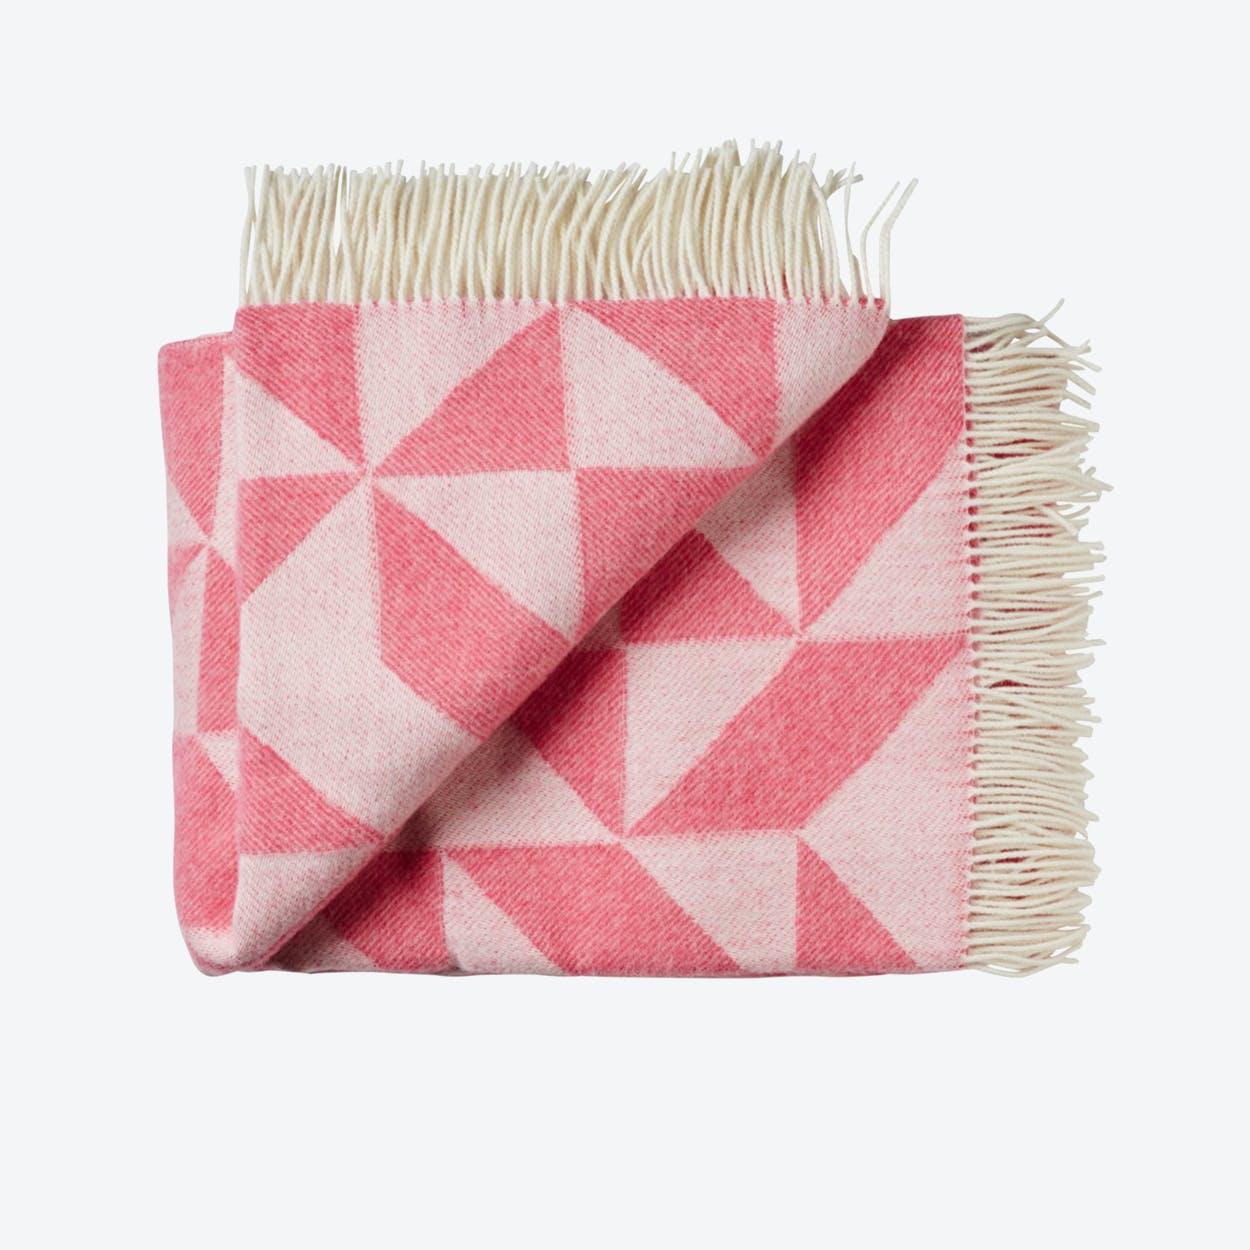 Twist A'Twill Wool Throw in Pink